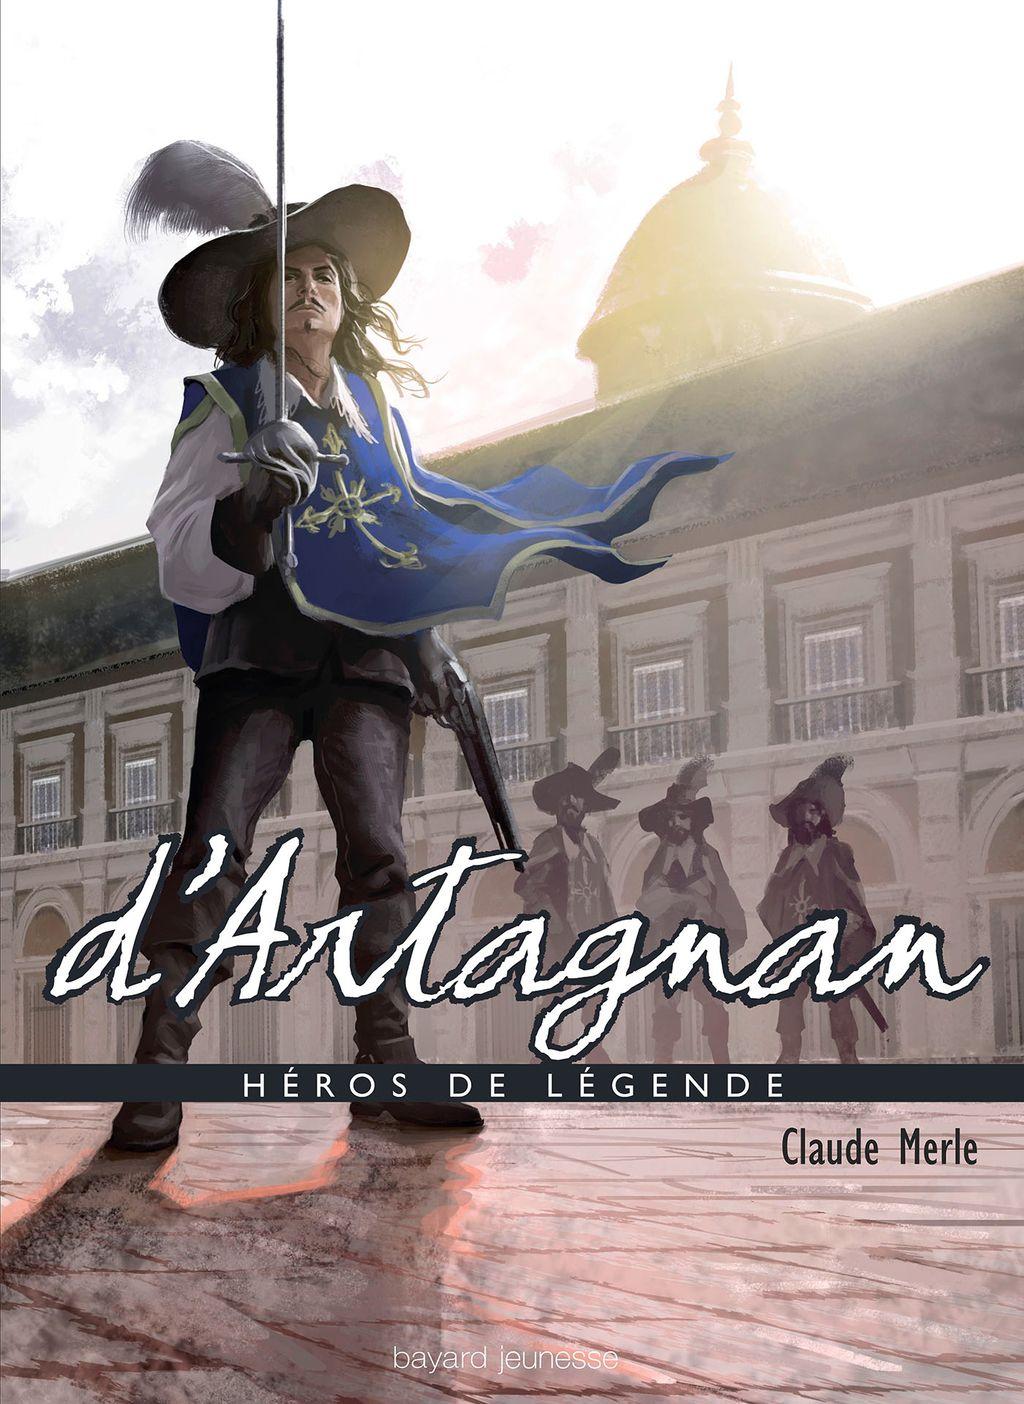 D Artagnan Ebook Claude Ebook The Three Musketeers